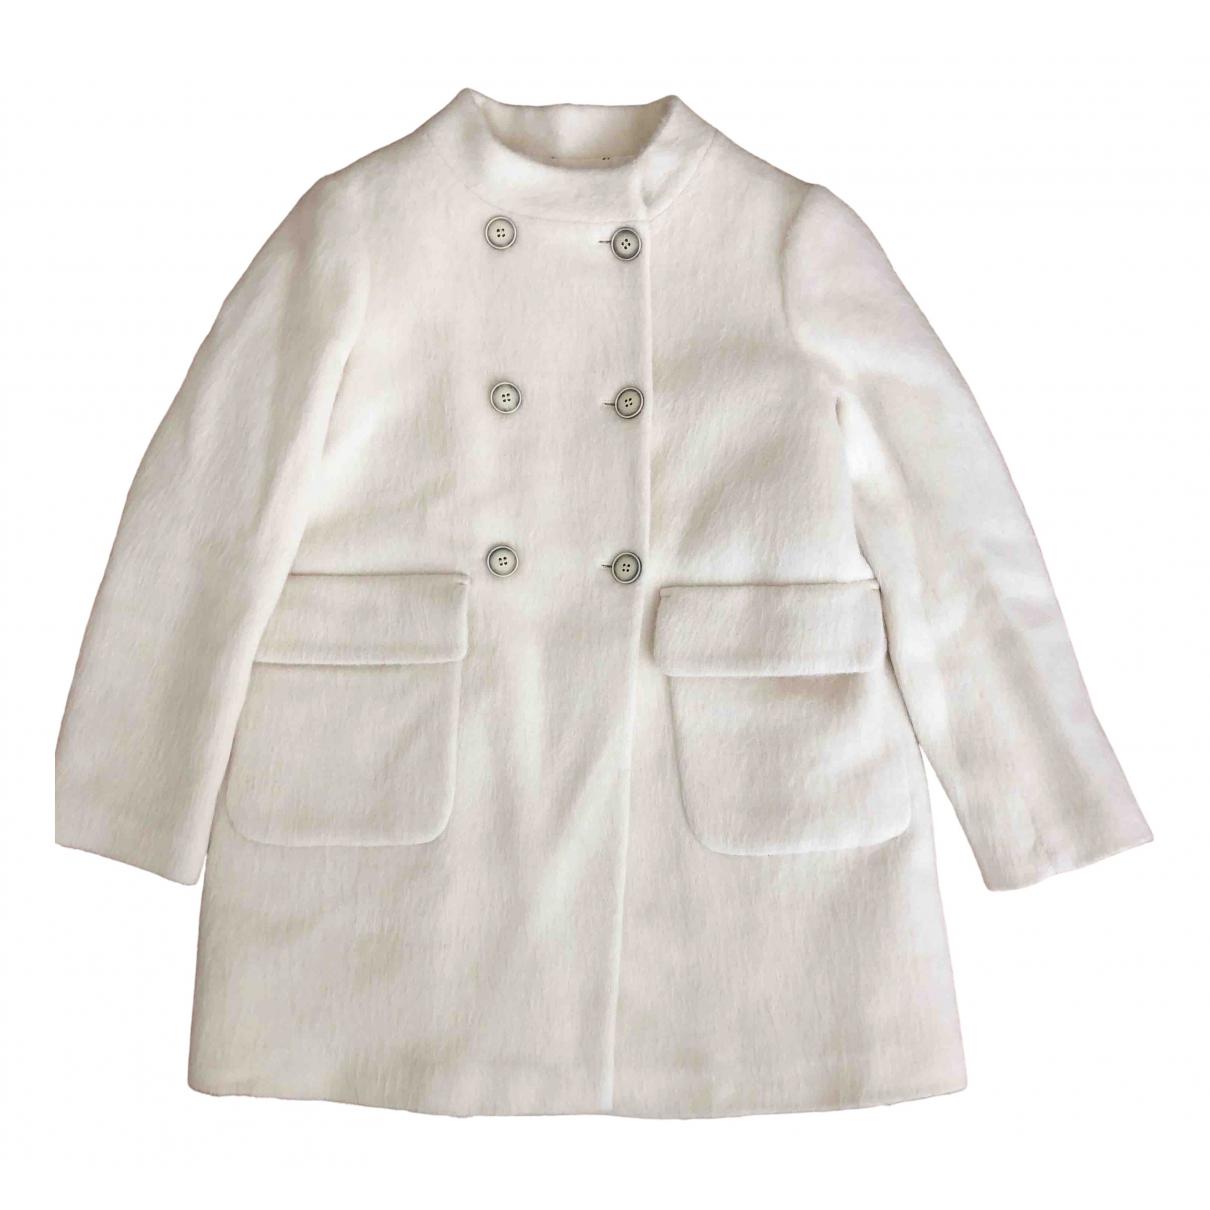 Bonpoint \N White Wool jacket & coat for Kids 12 years - XS FR